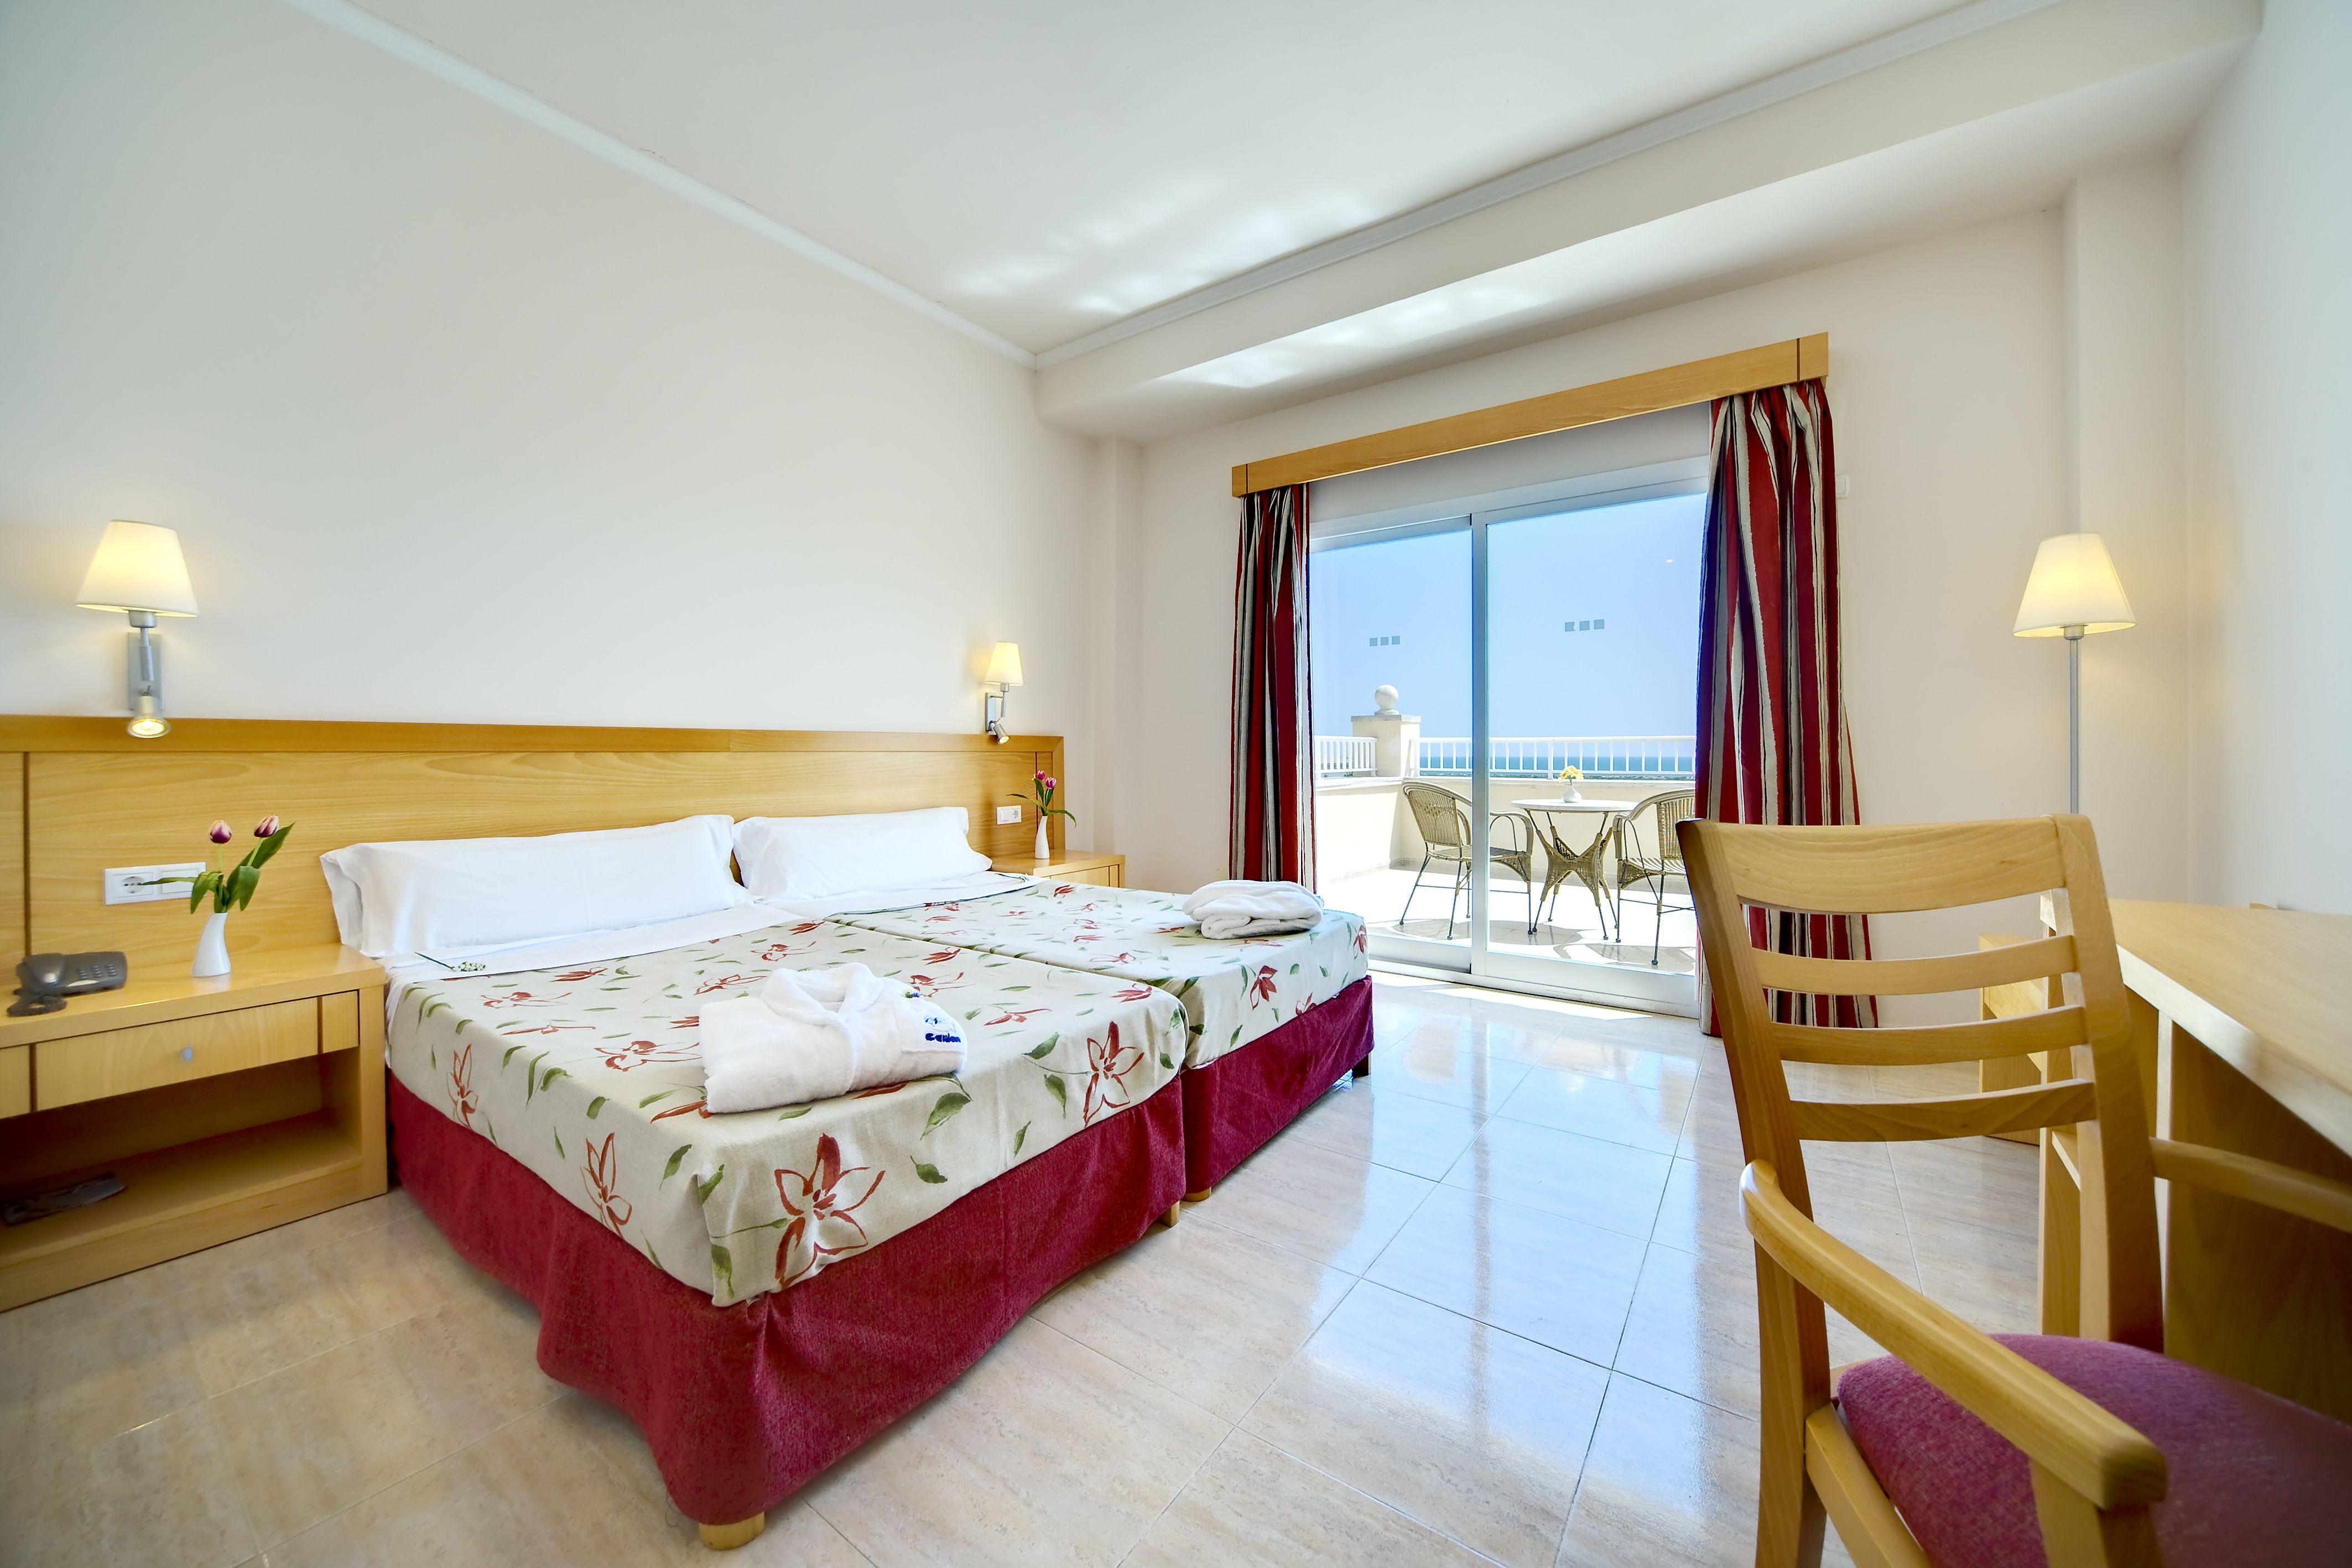 Garden Playanatural Hotel Spa Gardenhotels Andalucía Huelva Adultsonly Hotel Spa Hoteles